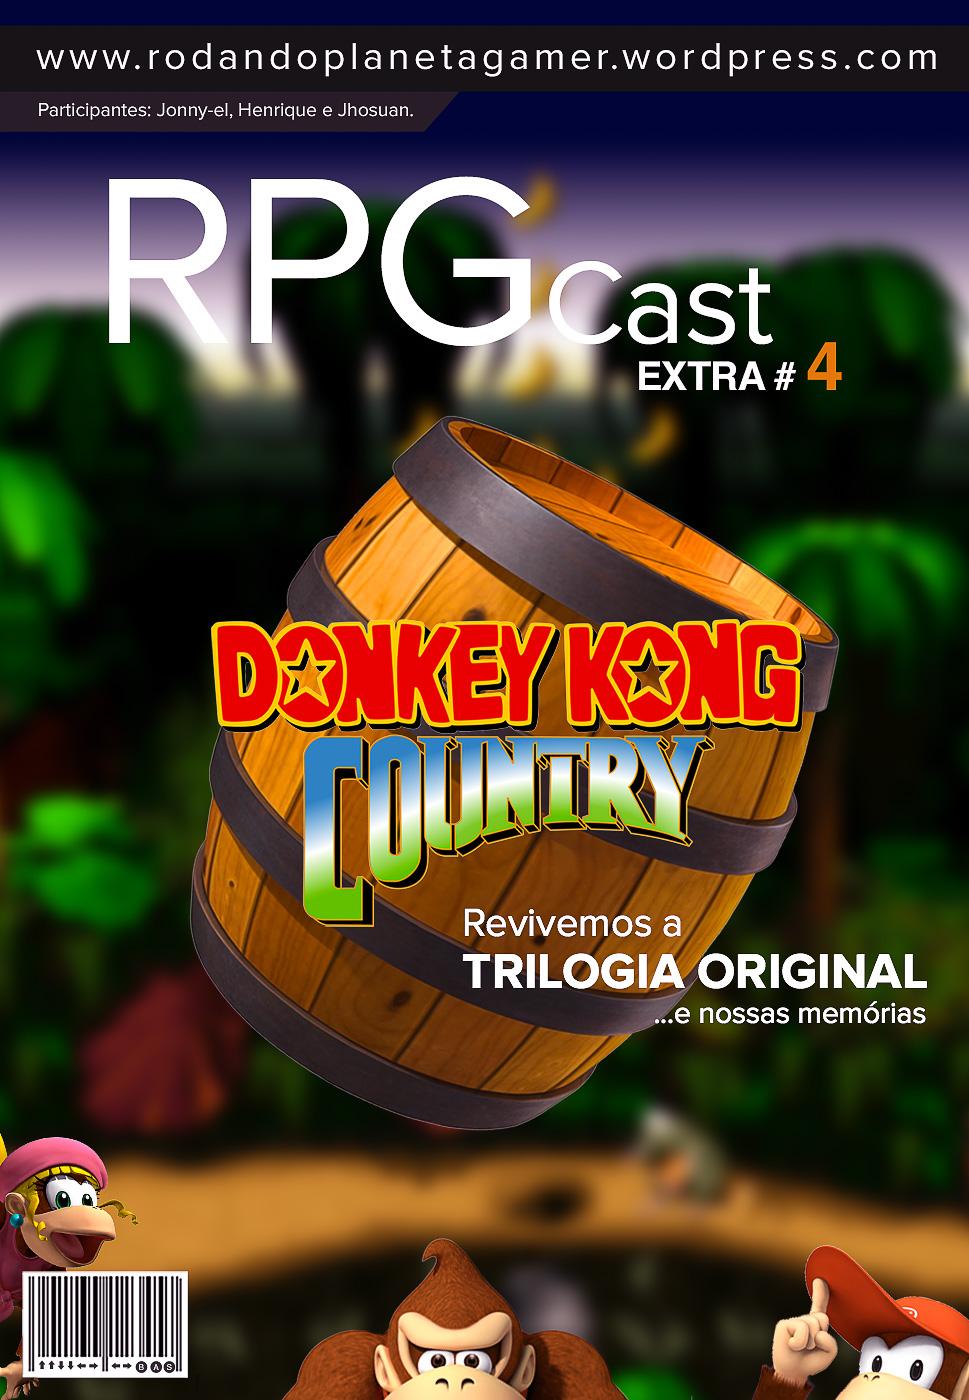 Rodando Planeta Gamer | Extra #4